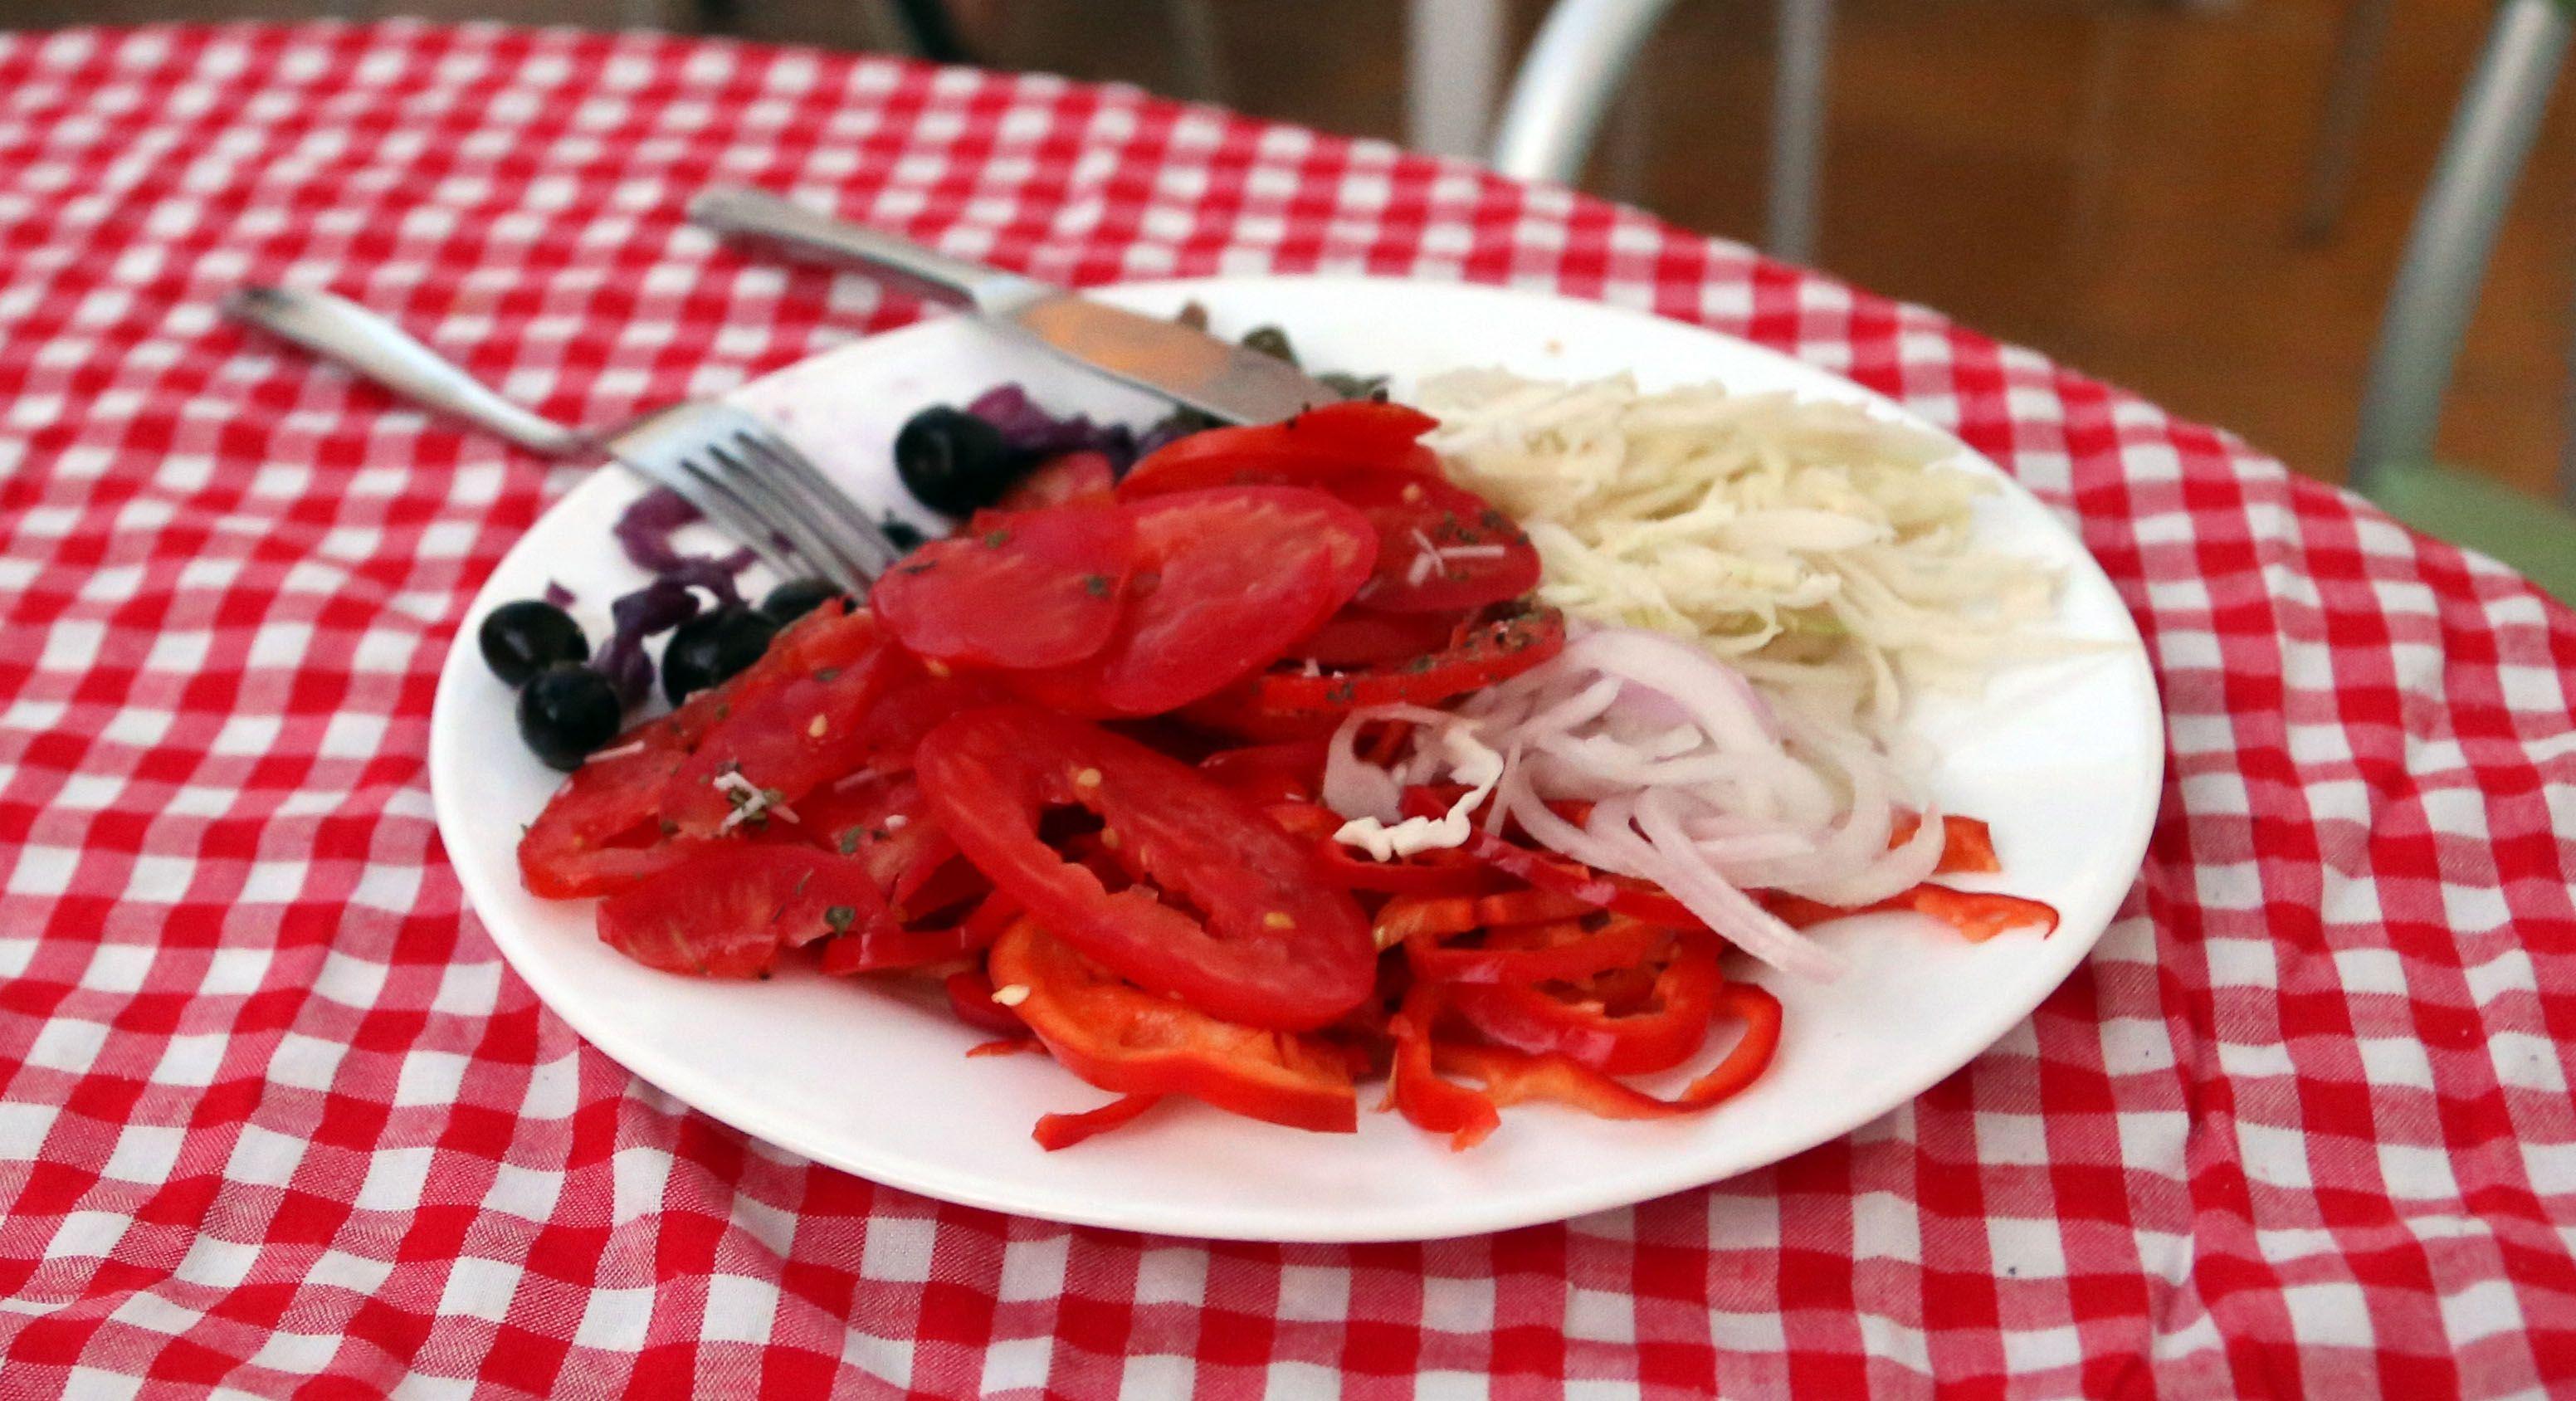 Tunesia buffet - Weight maintenance enemy # 1 Nice salat though | Marina Aagaard fitness blog